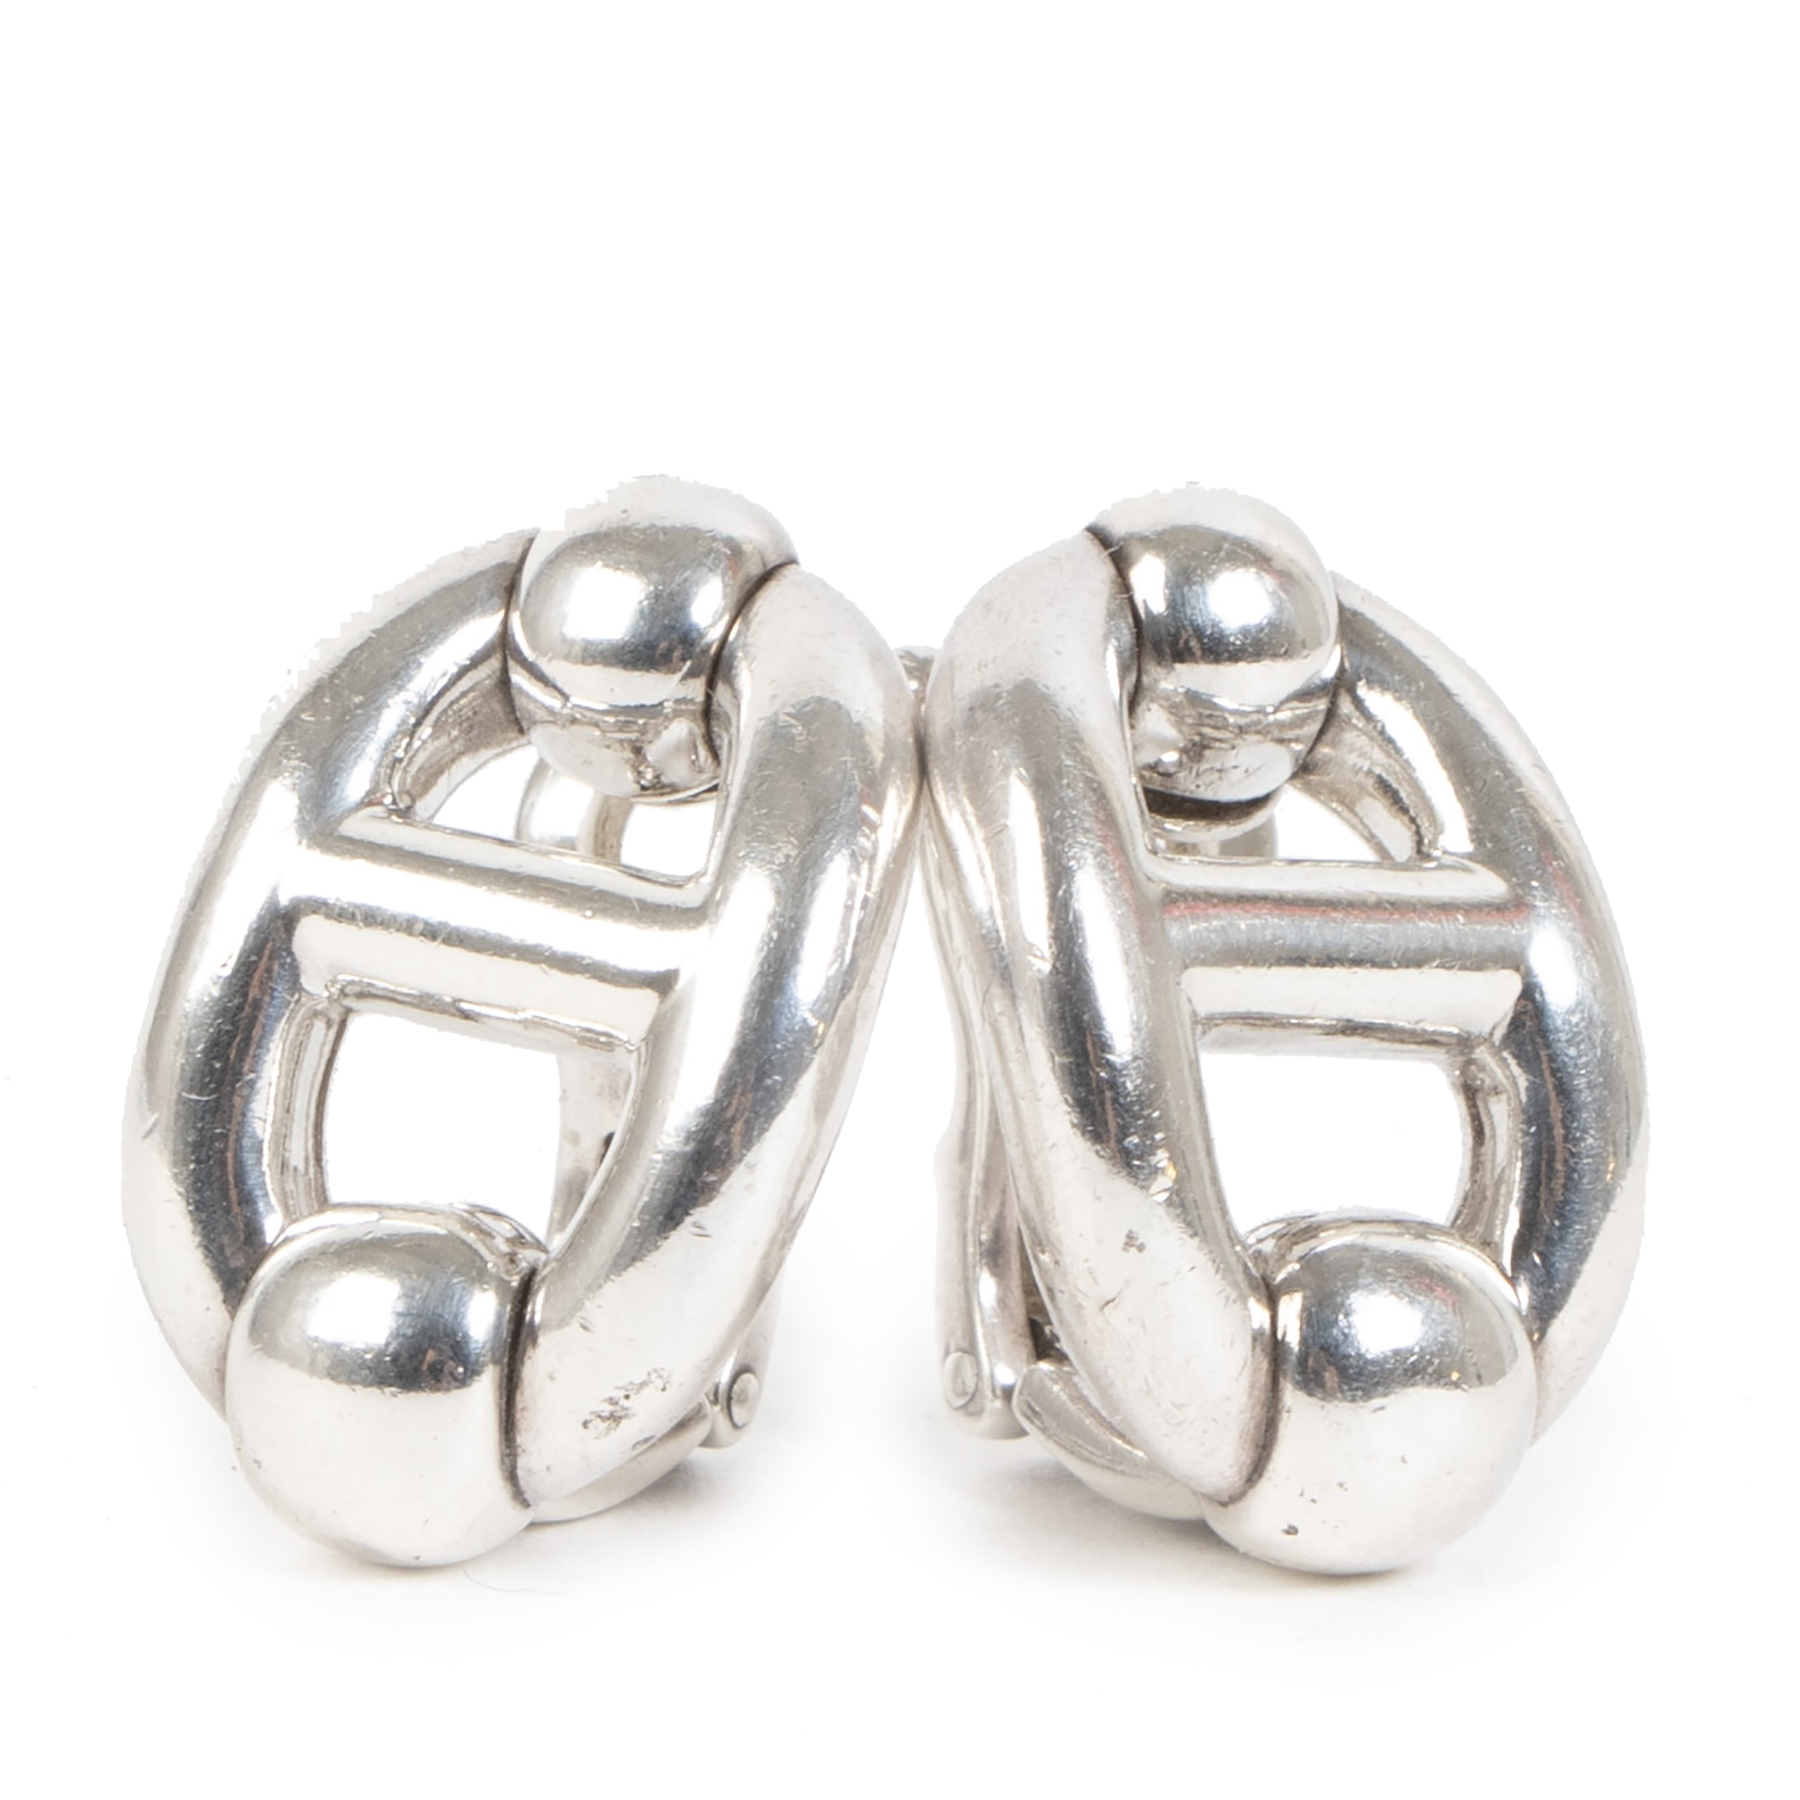 Authentieke Tweedehands Hérmes Chaine D'Ancre Sterling Silver Clip On Earring juiste prijs veilig online shoppen luxe merken webshop winkelen Antwerpen België mode fashion